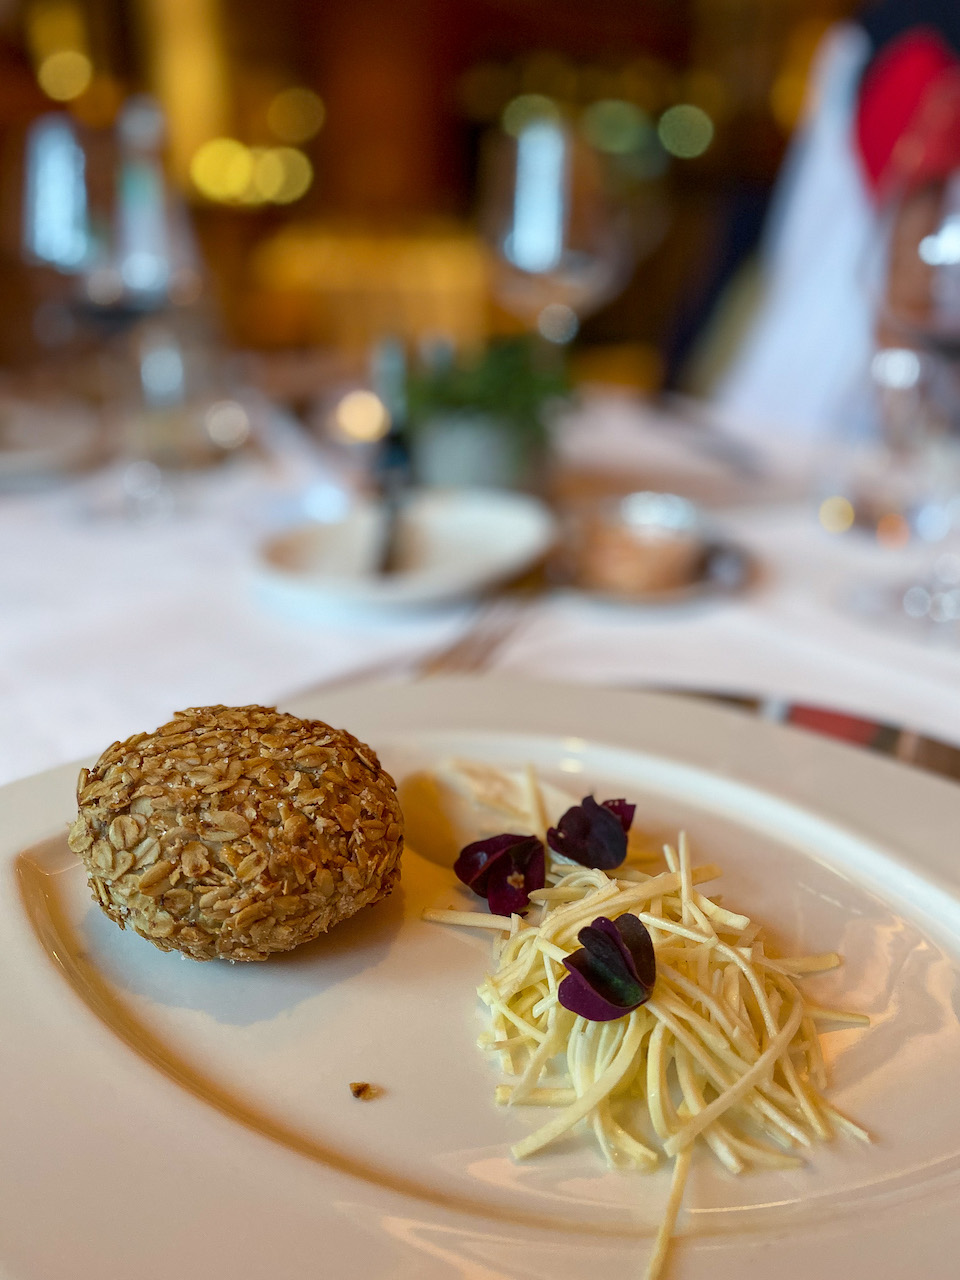 wellness hotel Engel in Carezza - Zuid Tirol  - Theodor Falser